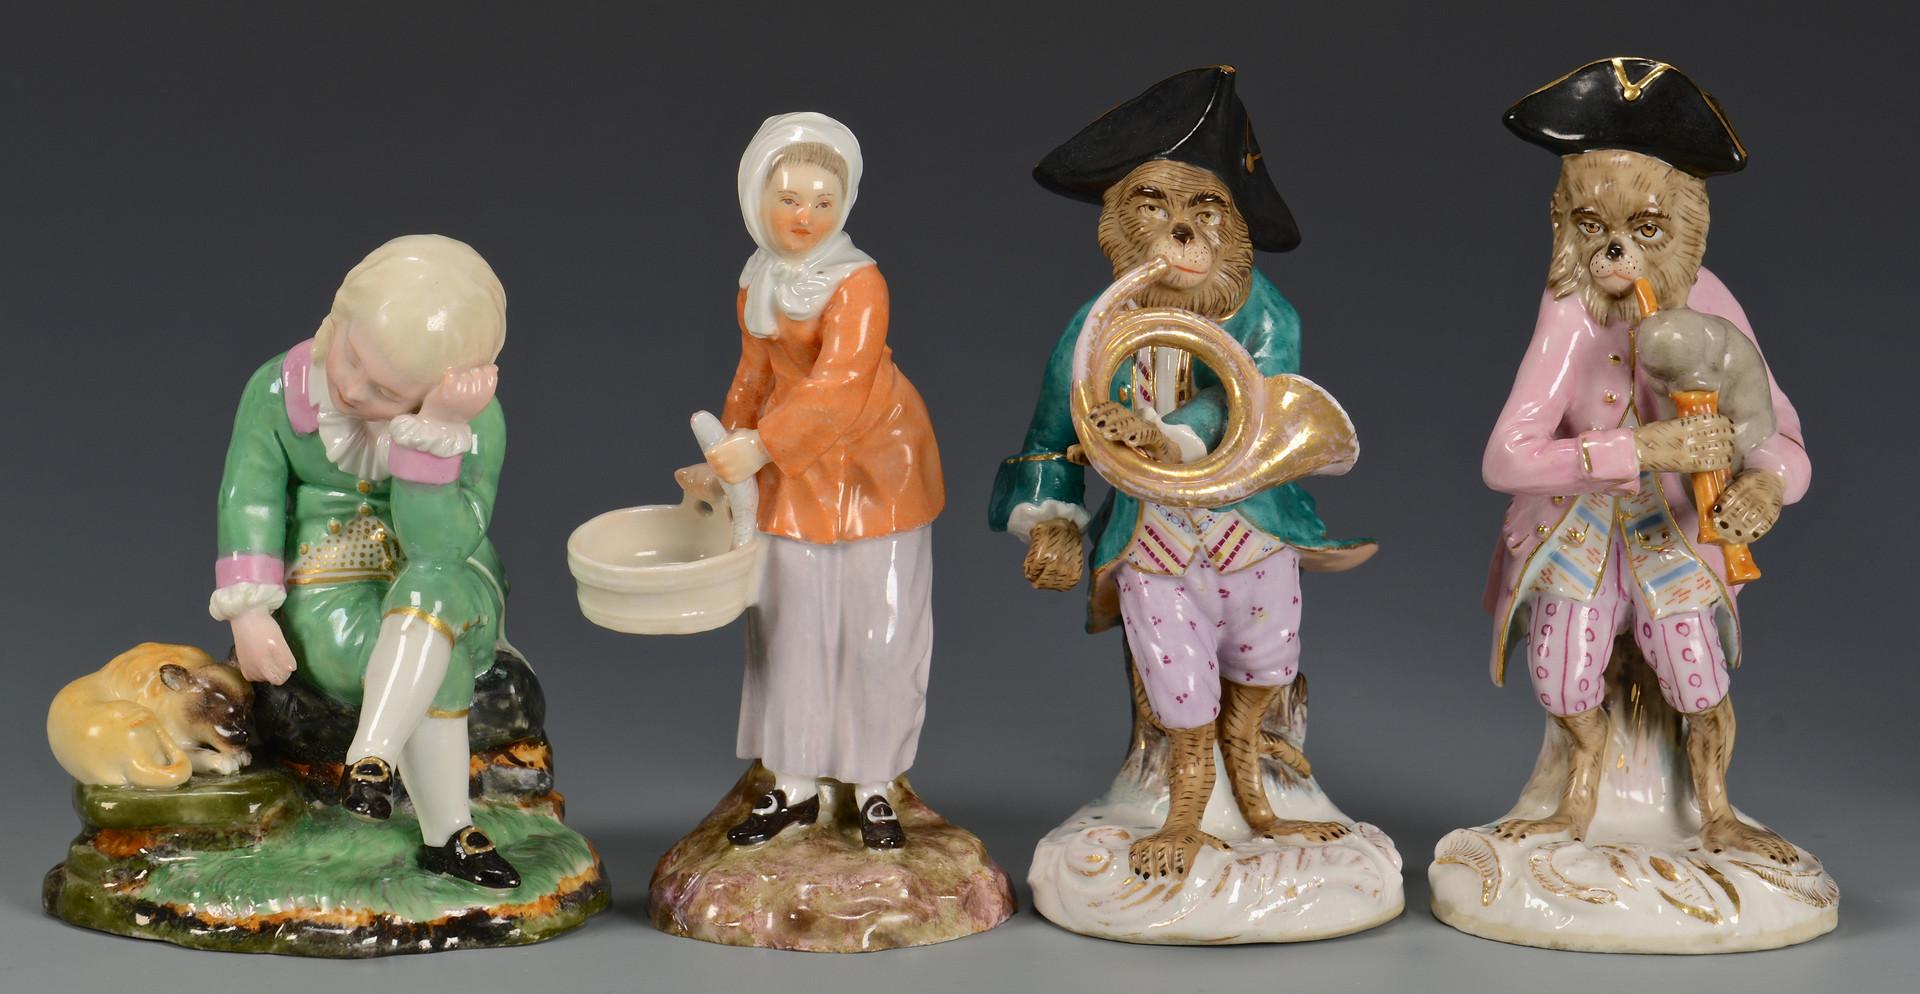 Lot 617: 8 Porcelain Figurines